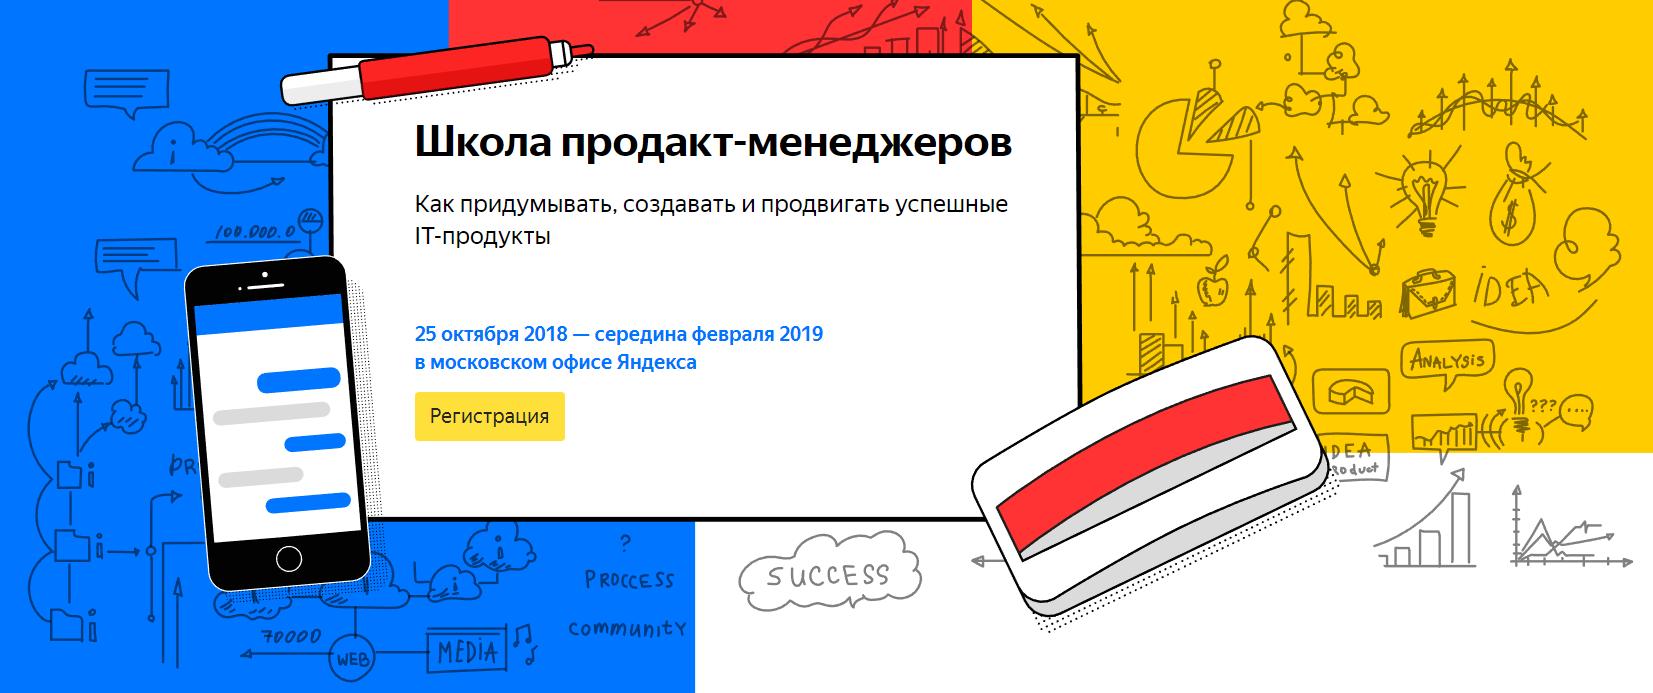 Школа Продакт-менеджеров Яндекса. Стоит ли идти?